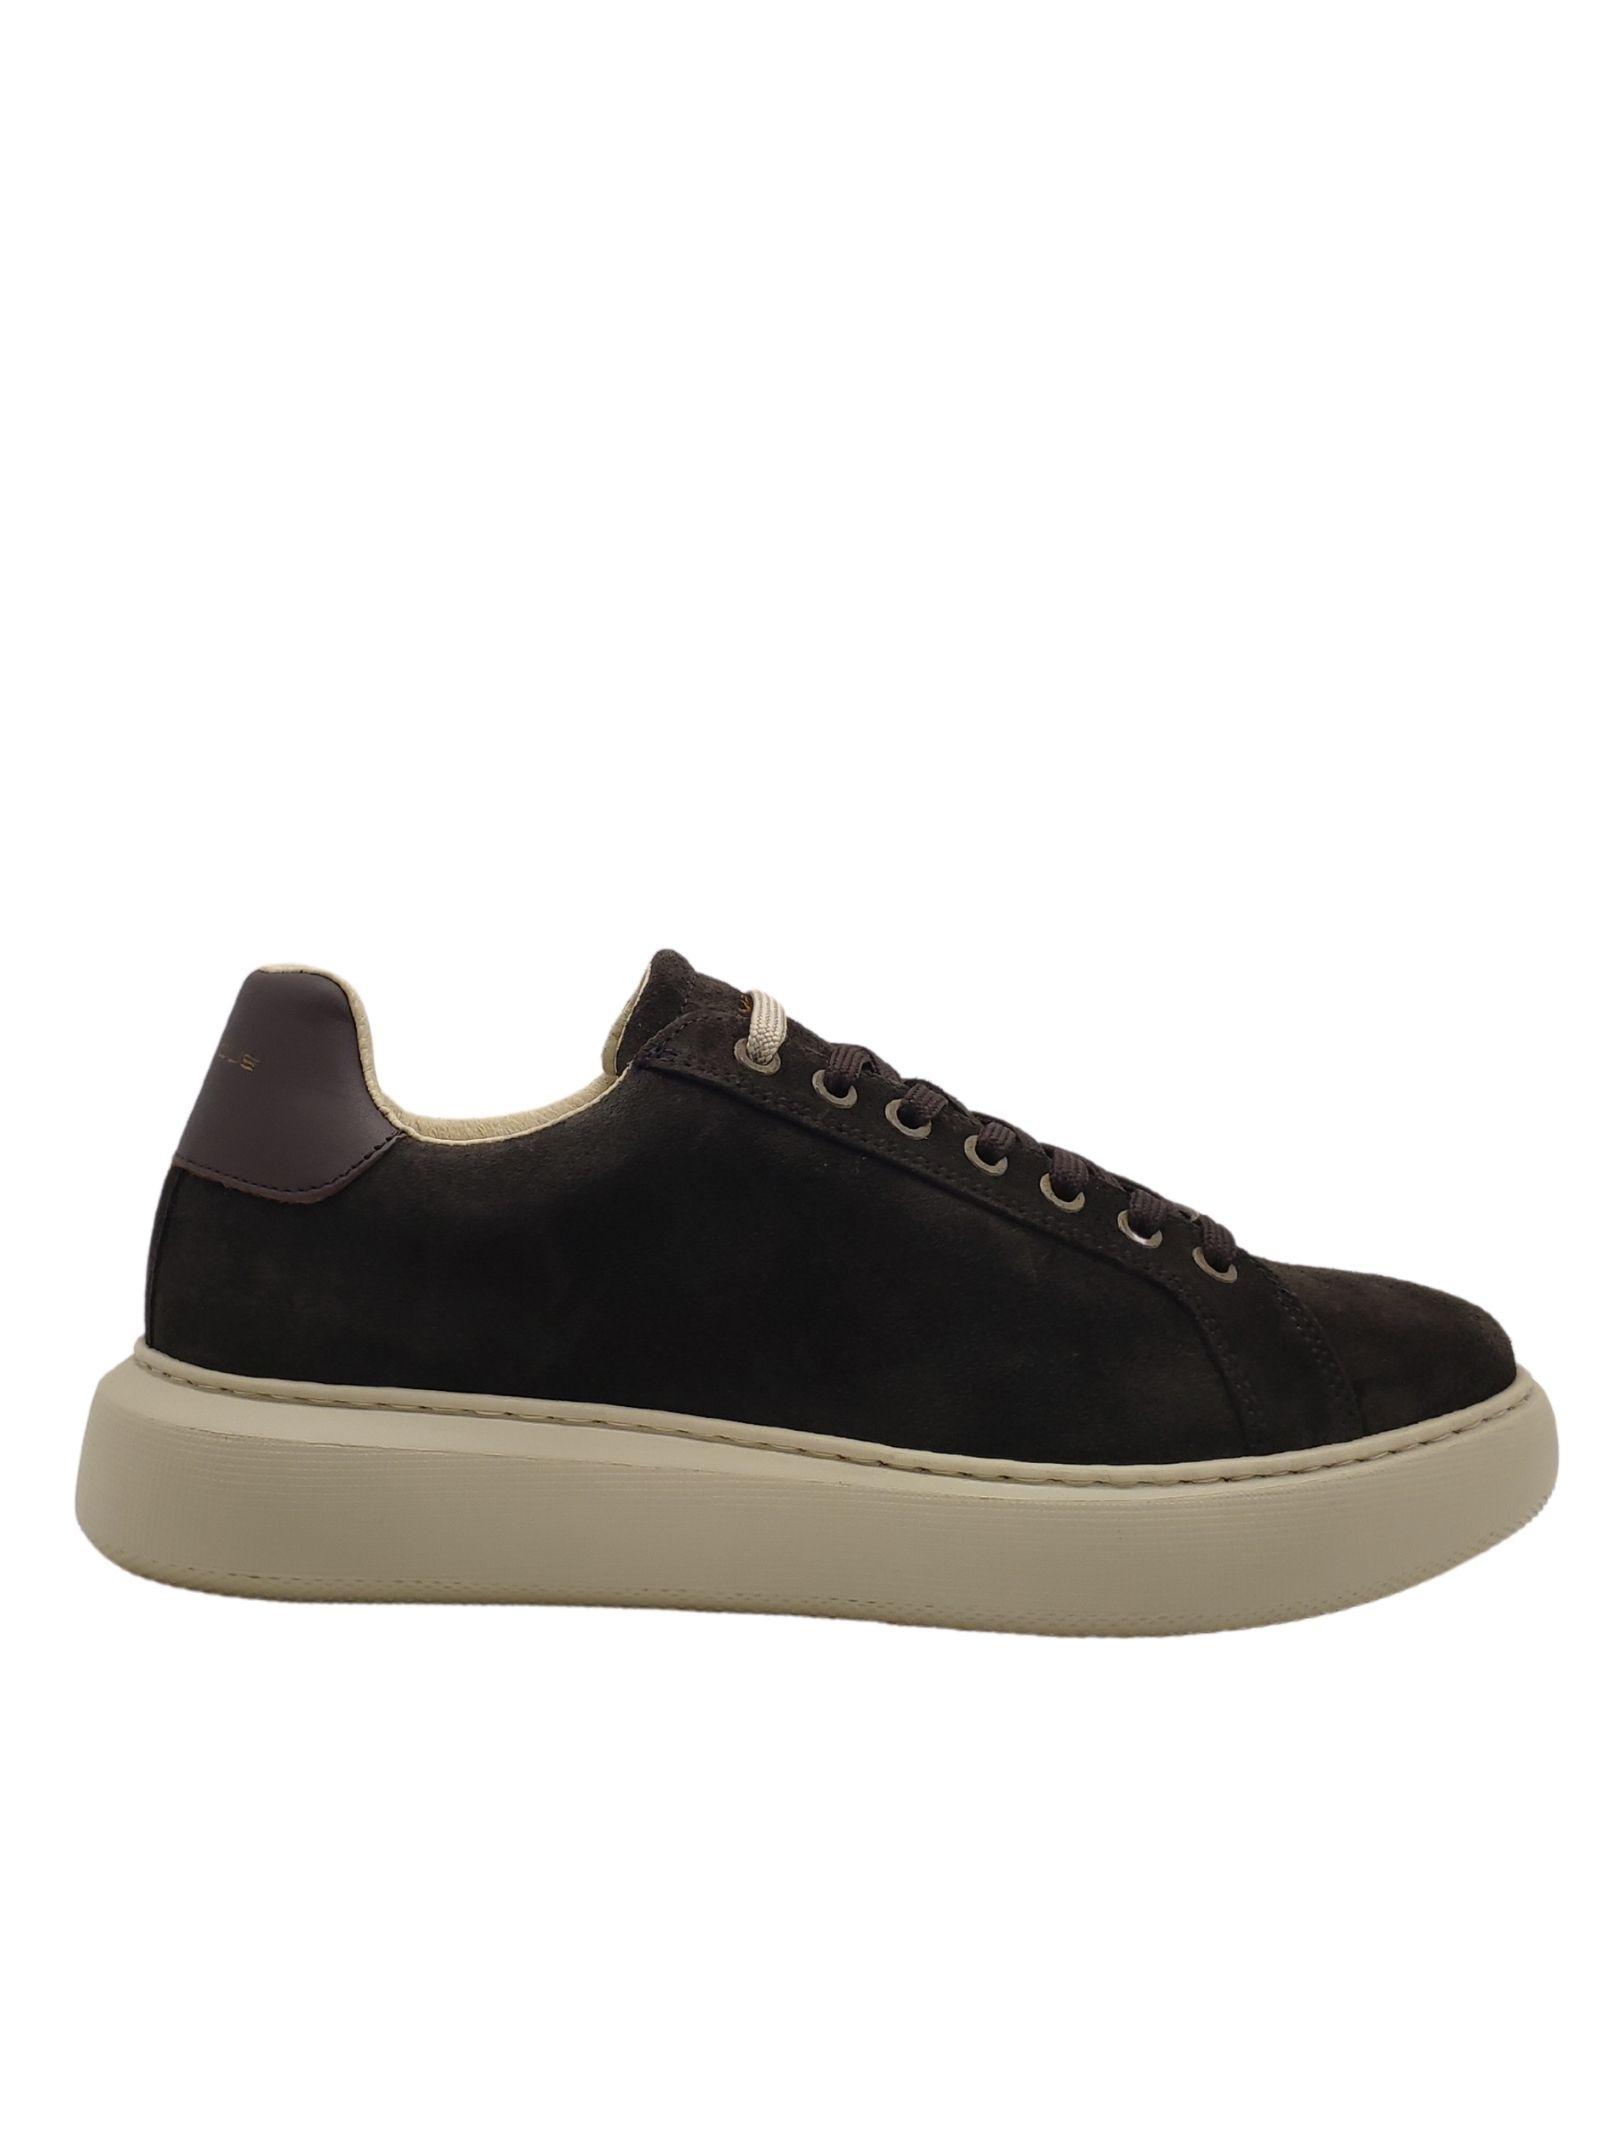 Men's Sneakers Dark Brown Ambitious   Sneakers   8320MORO